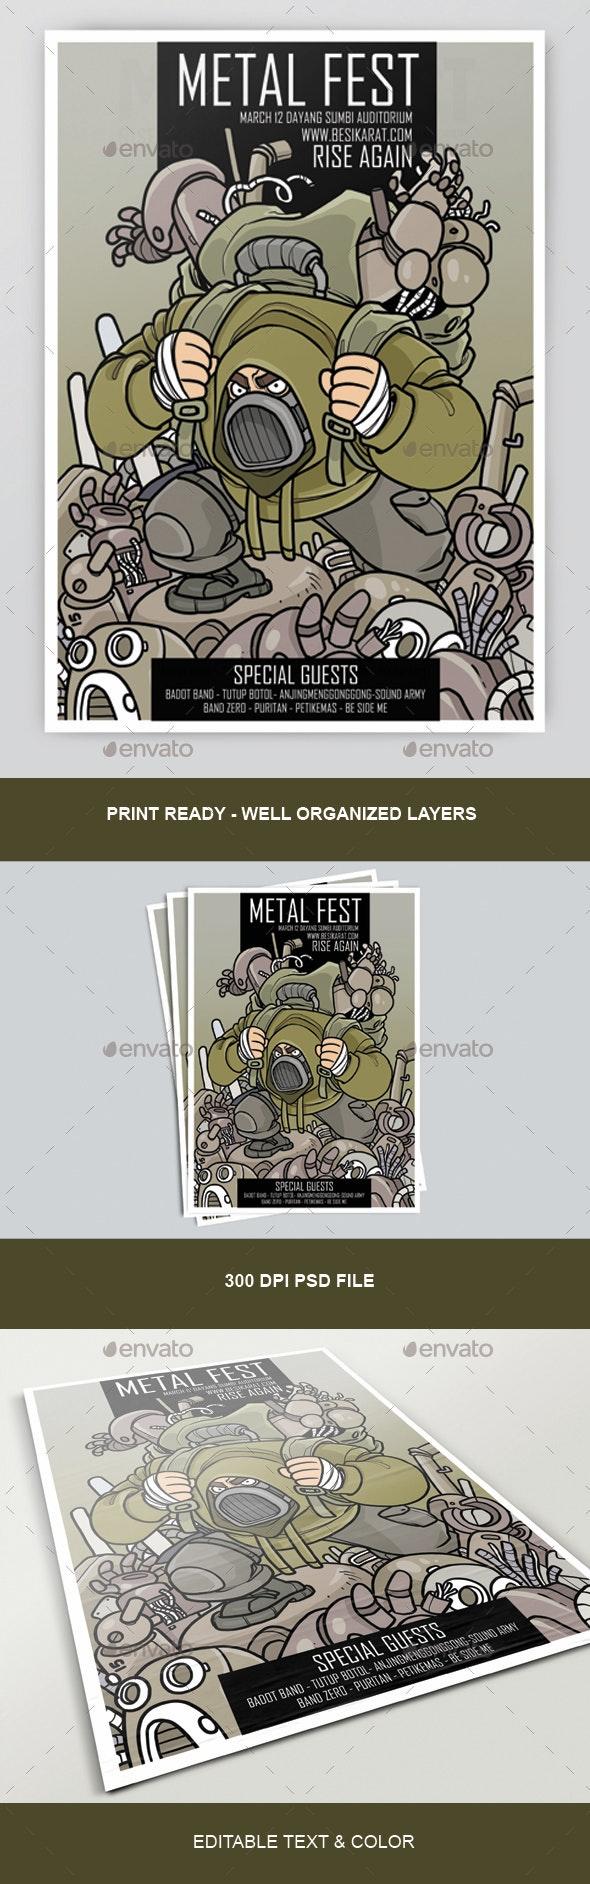 Metal Fest Poster - Miscellaneous Events